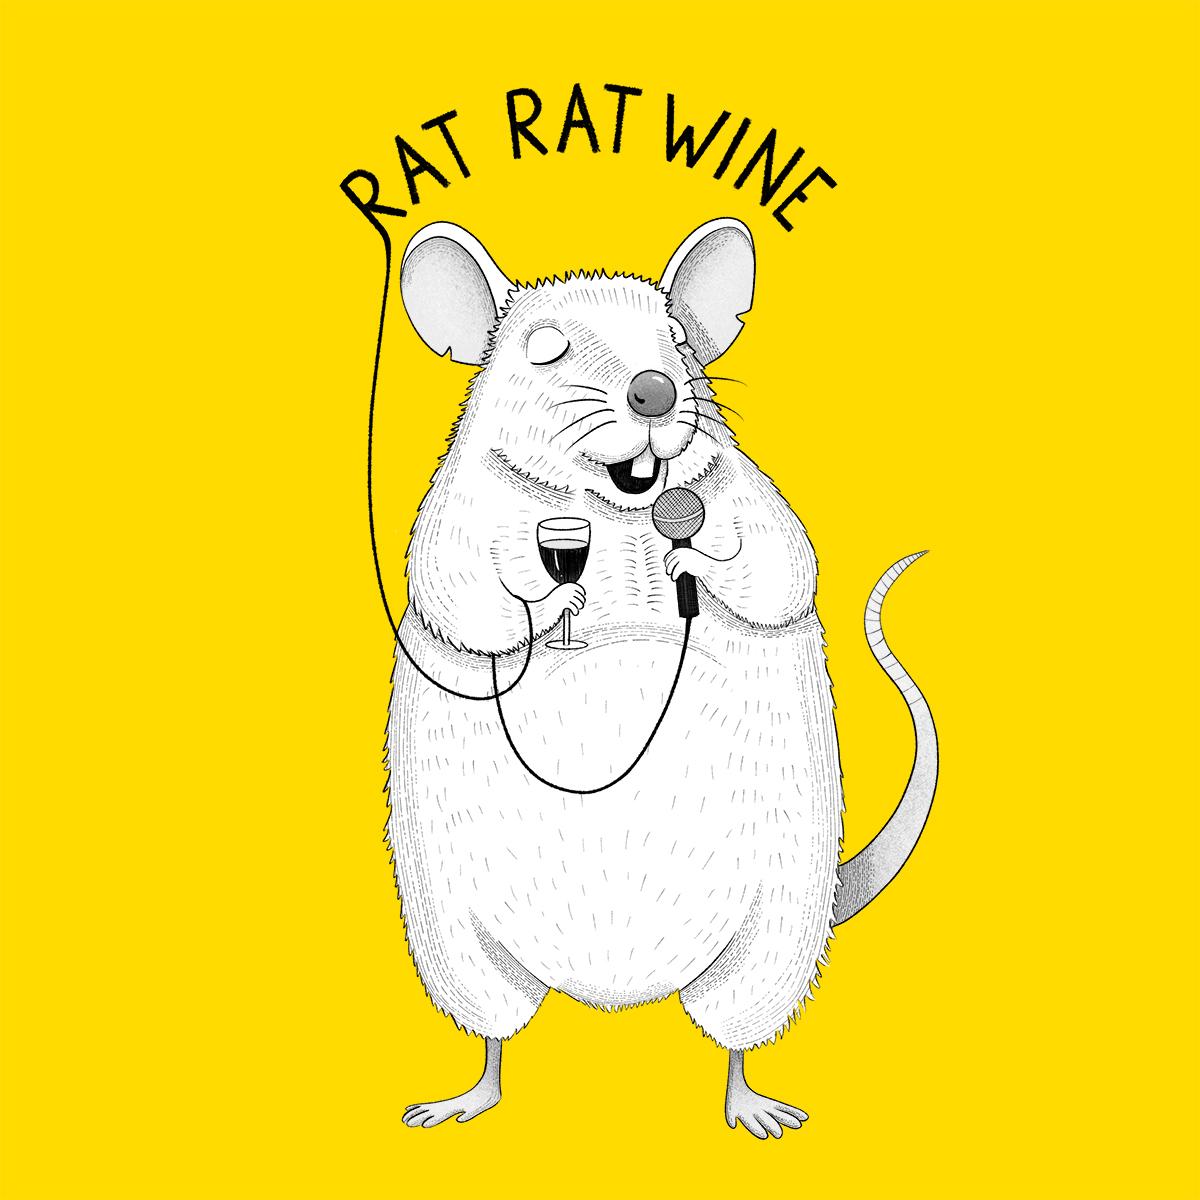 Rat singing UB40 animal karaoke illustration by drawingeggen